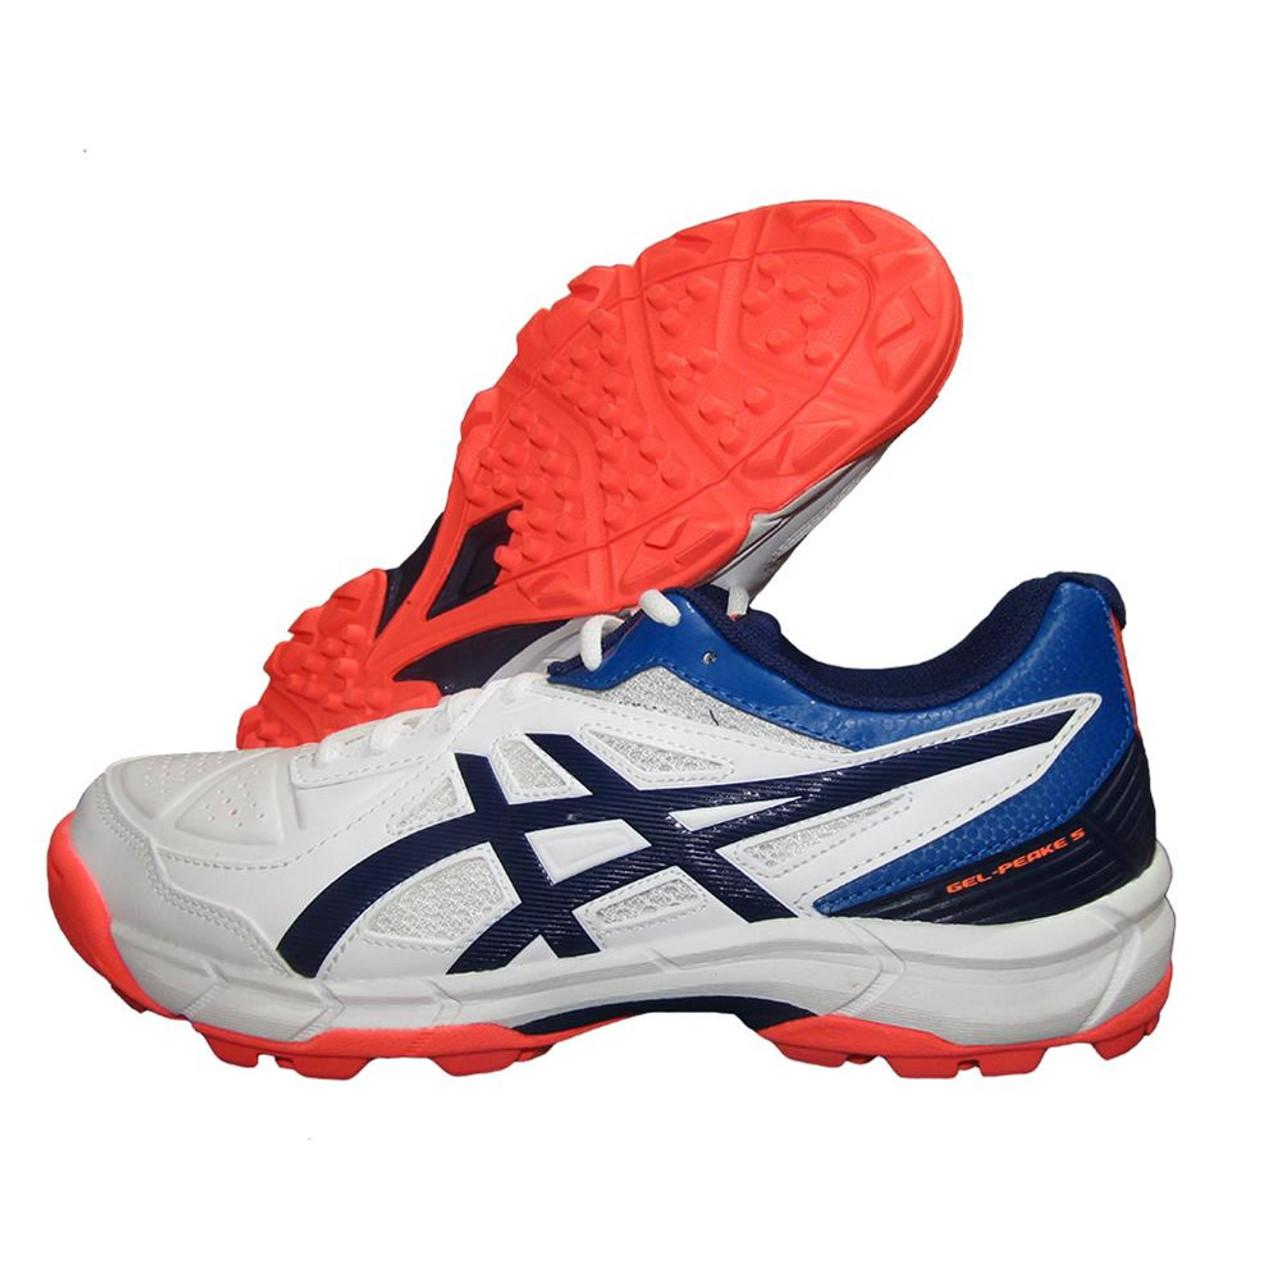 Asics Gel-Peake 5 Cricket Shoes White